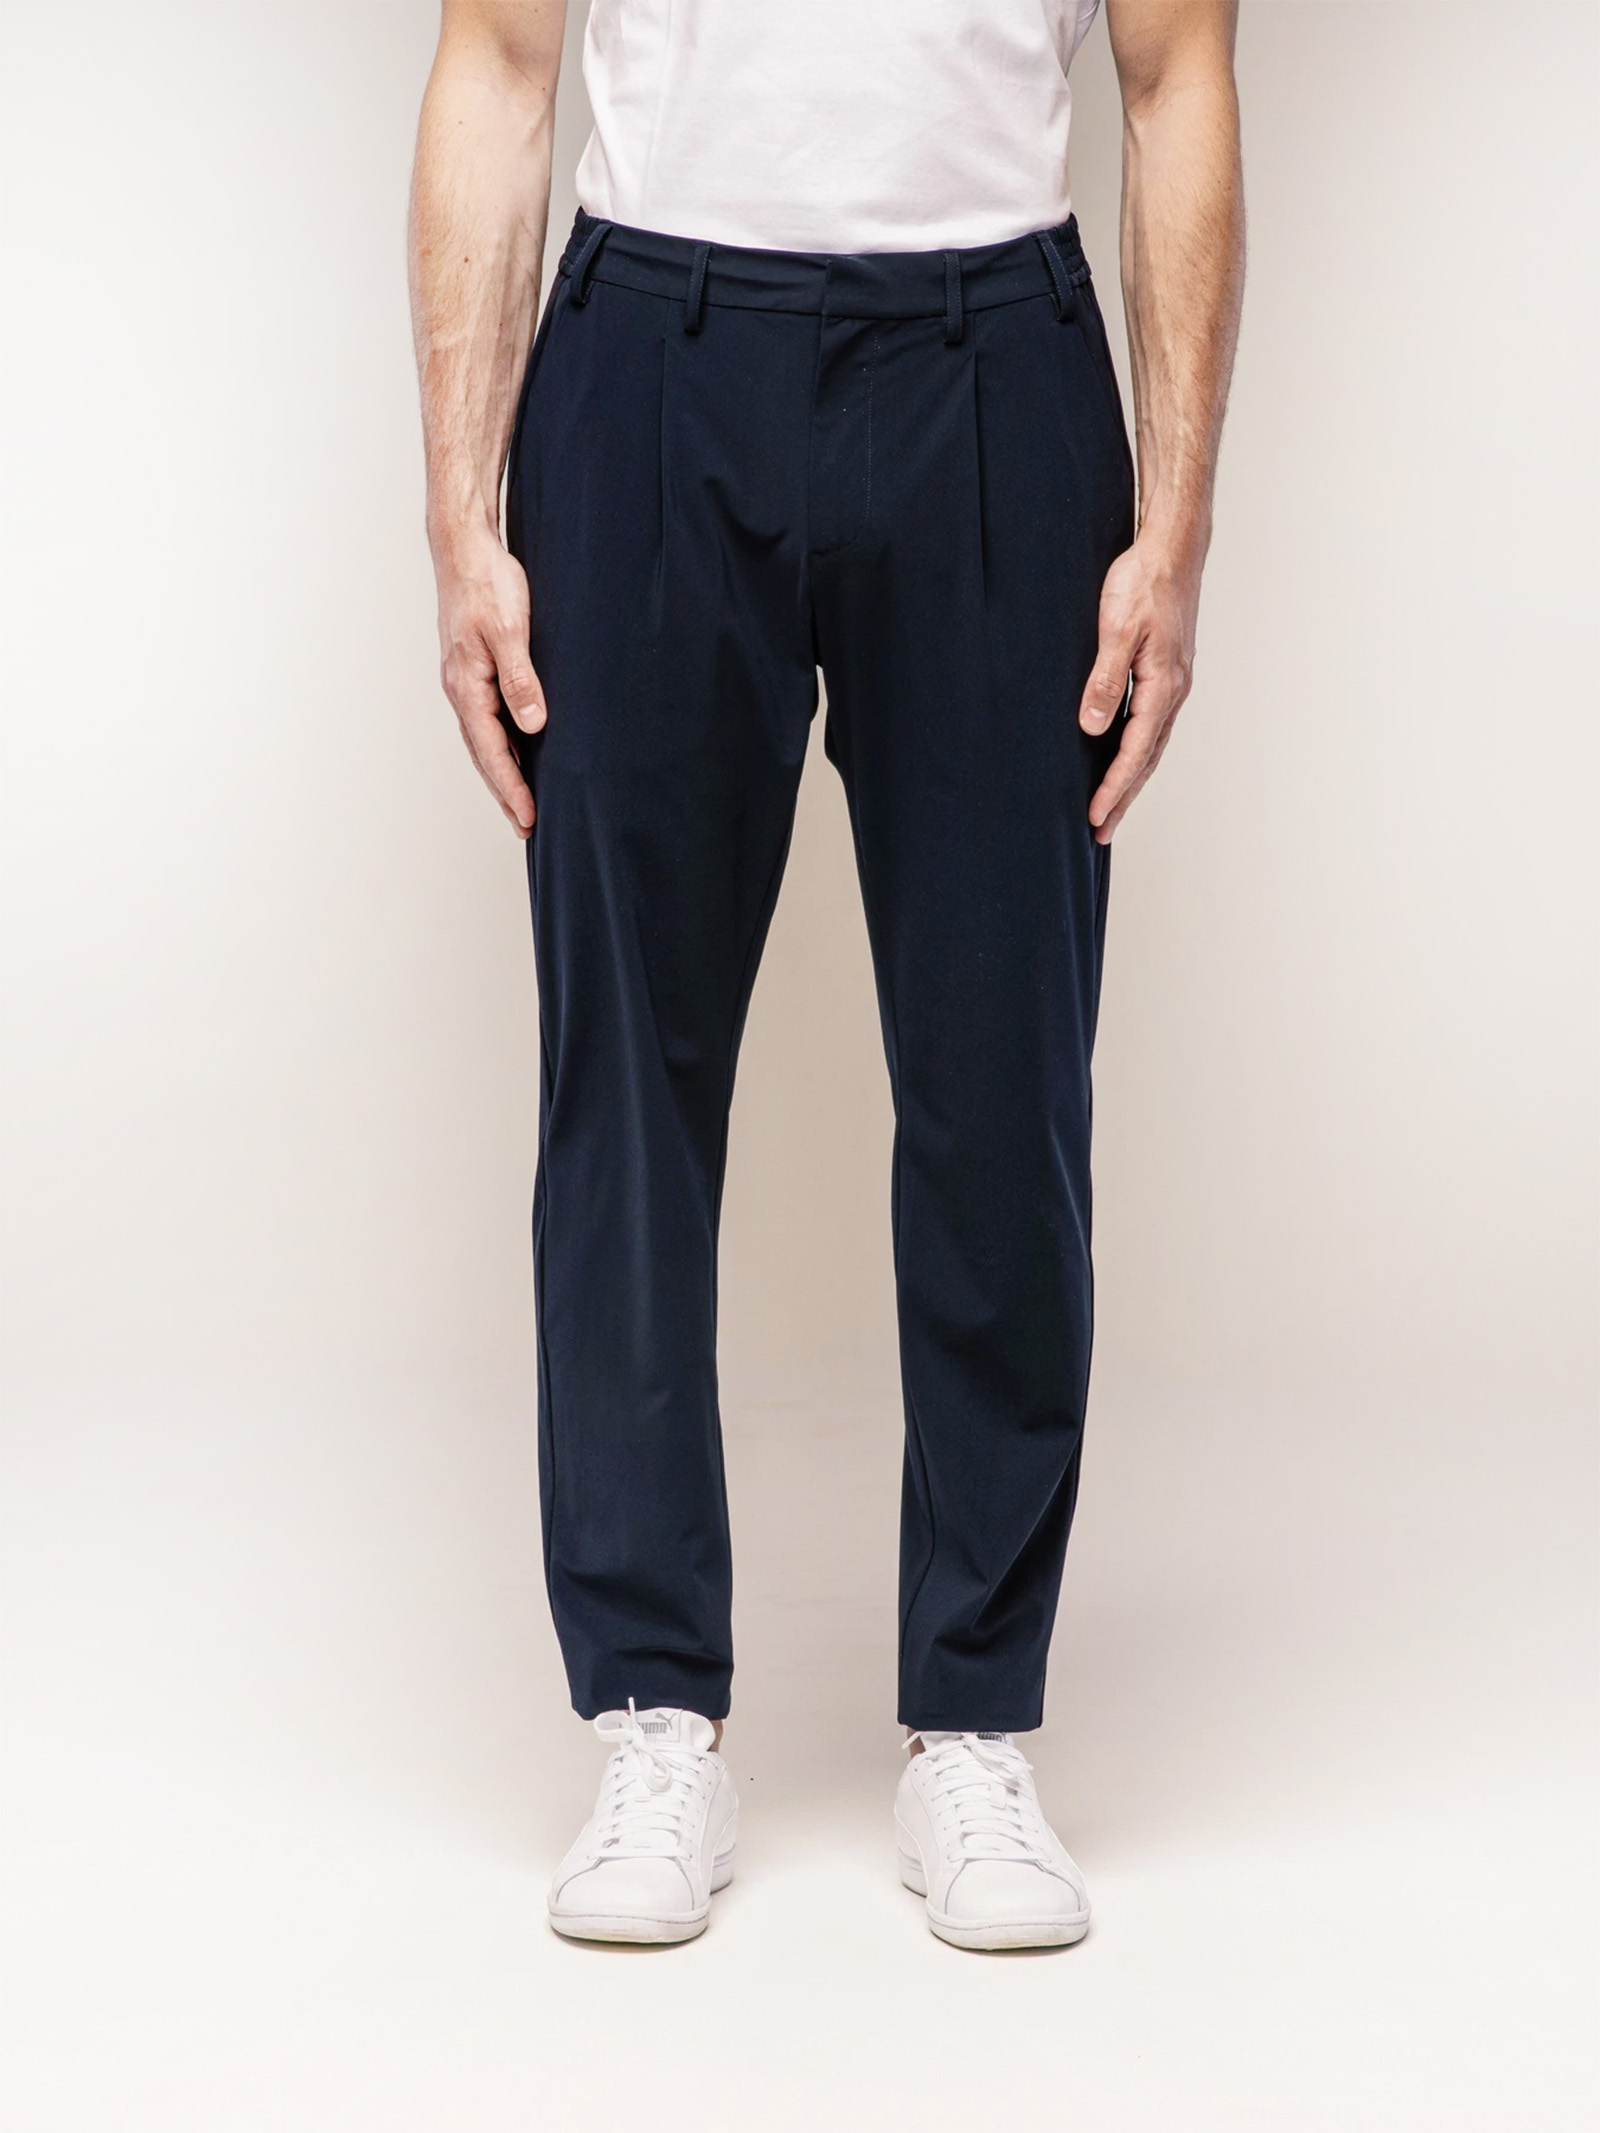 Pantalone KOBRA PEOPLE OF SHIBUYA   Pantalone   KOBRA-PM750790